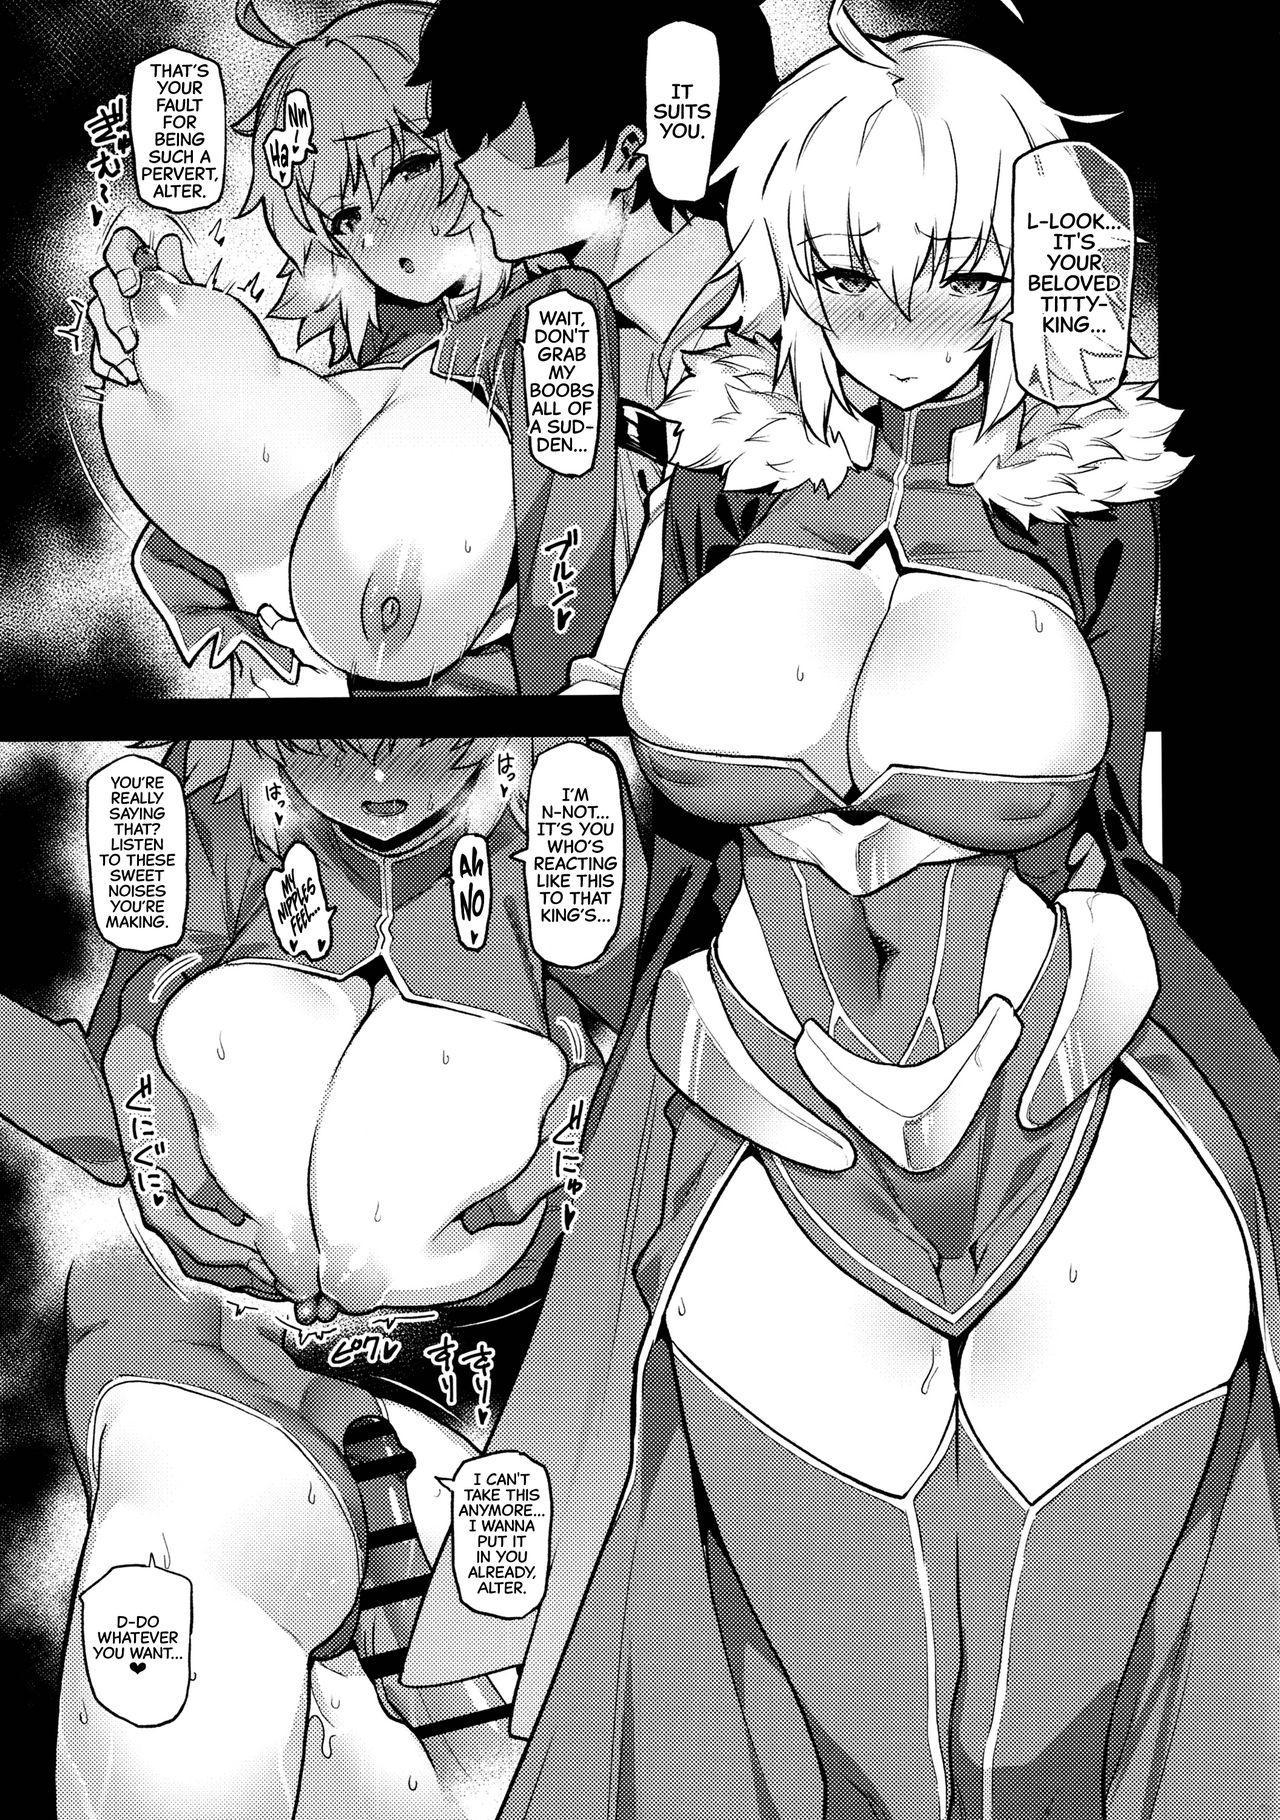 Suki Nandesho? Master wa, Kouiu no ga... | You Like This, Don't You, Master? This Sort Of Thing, I Mean... 11